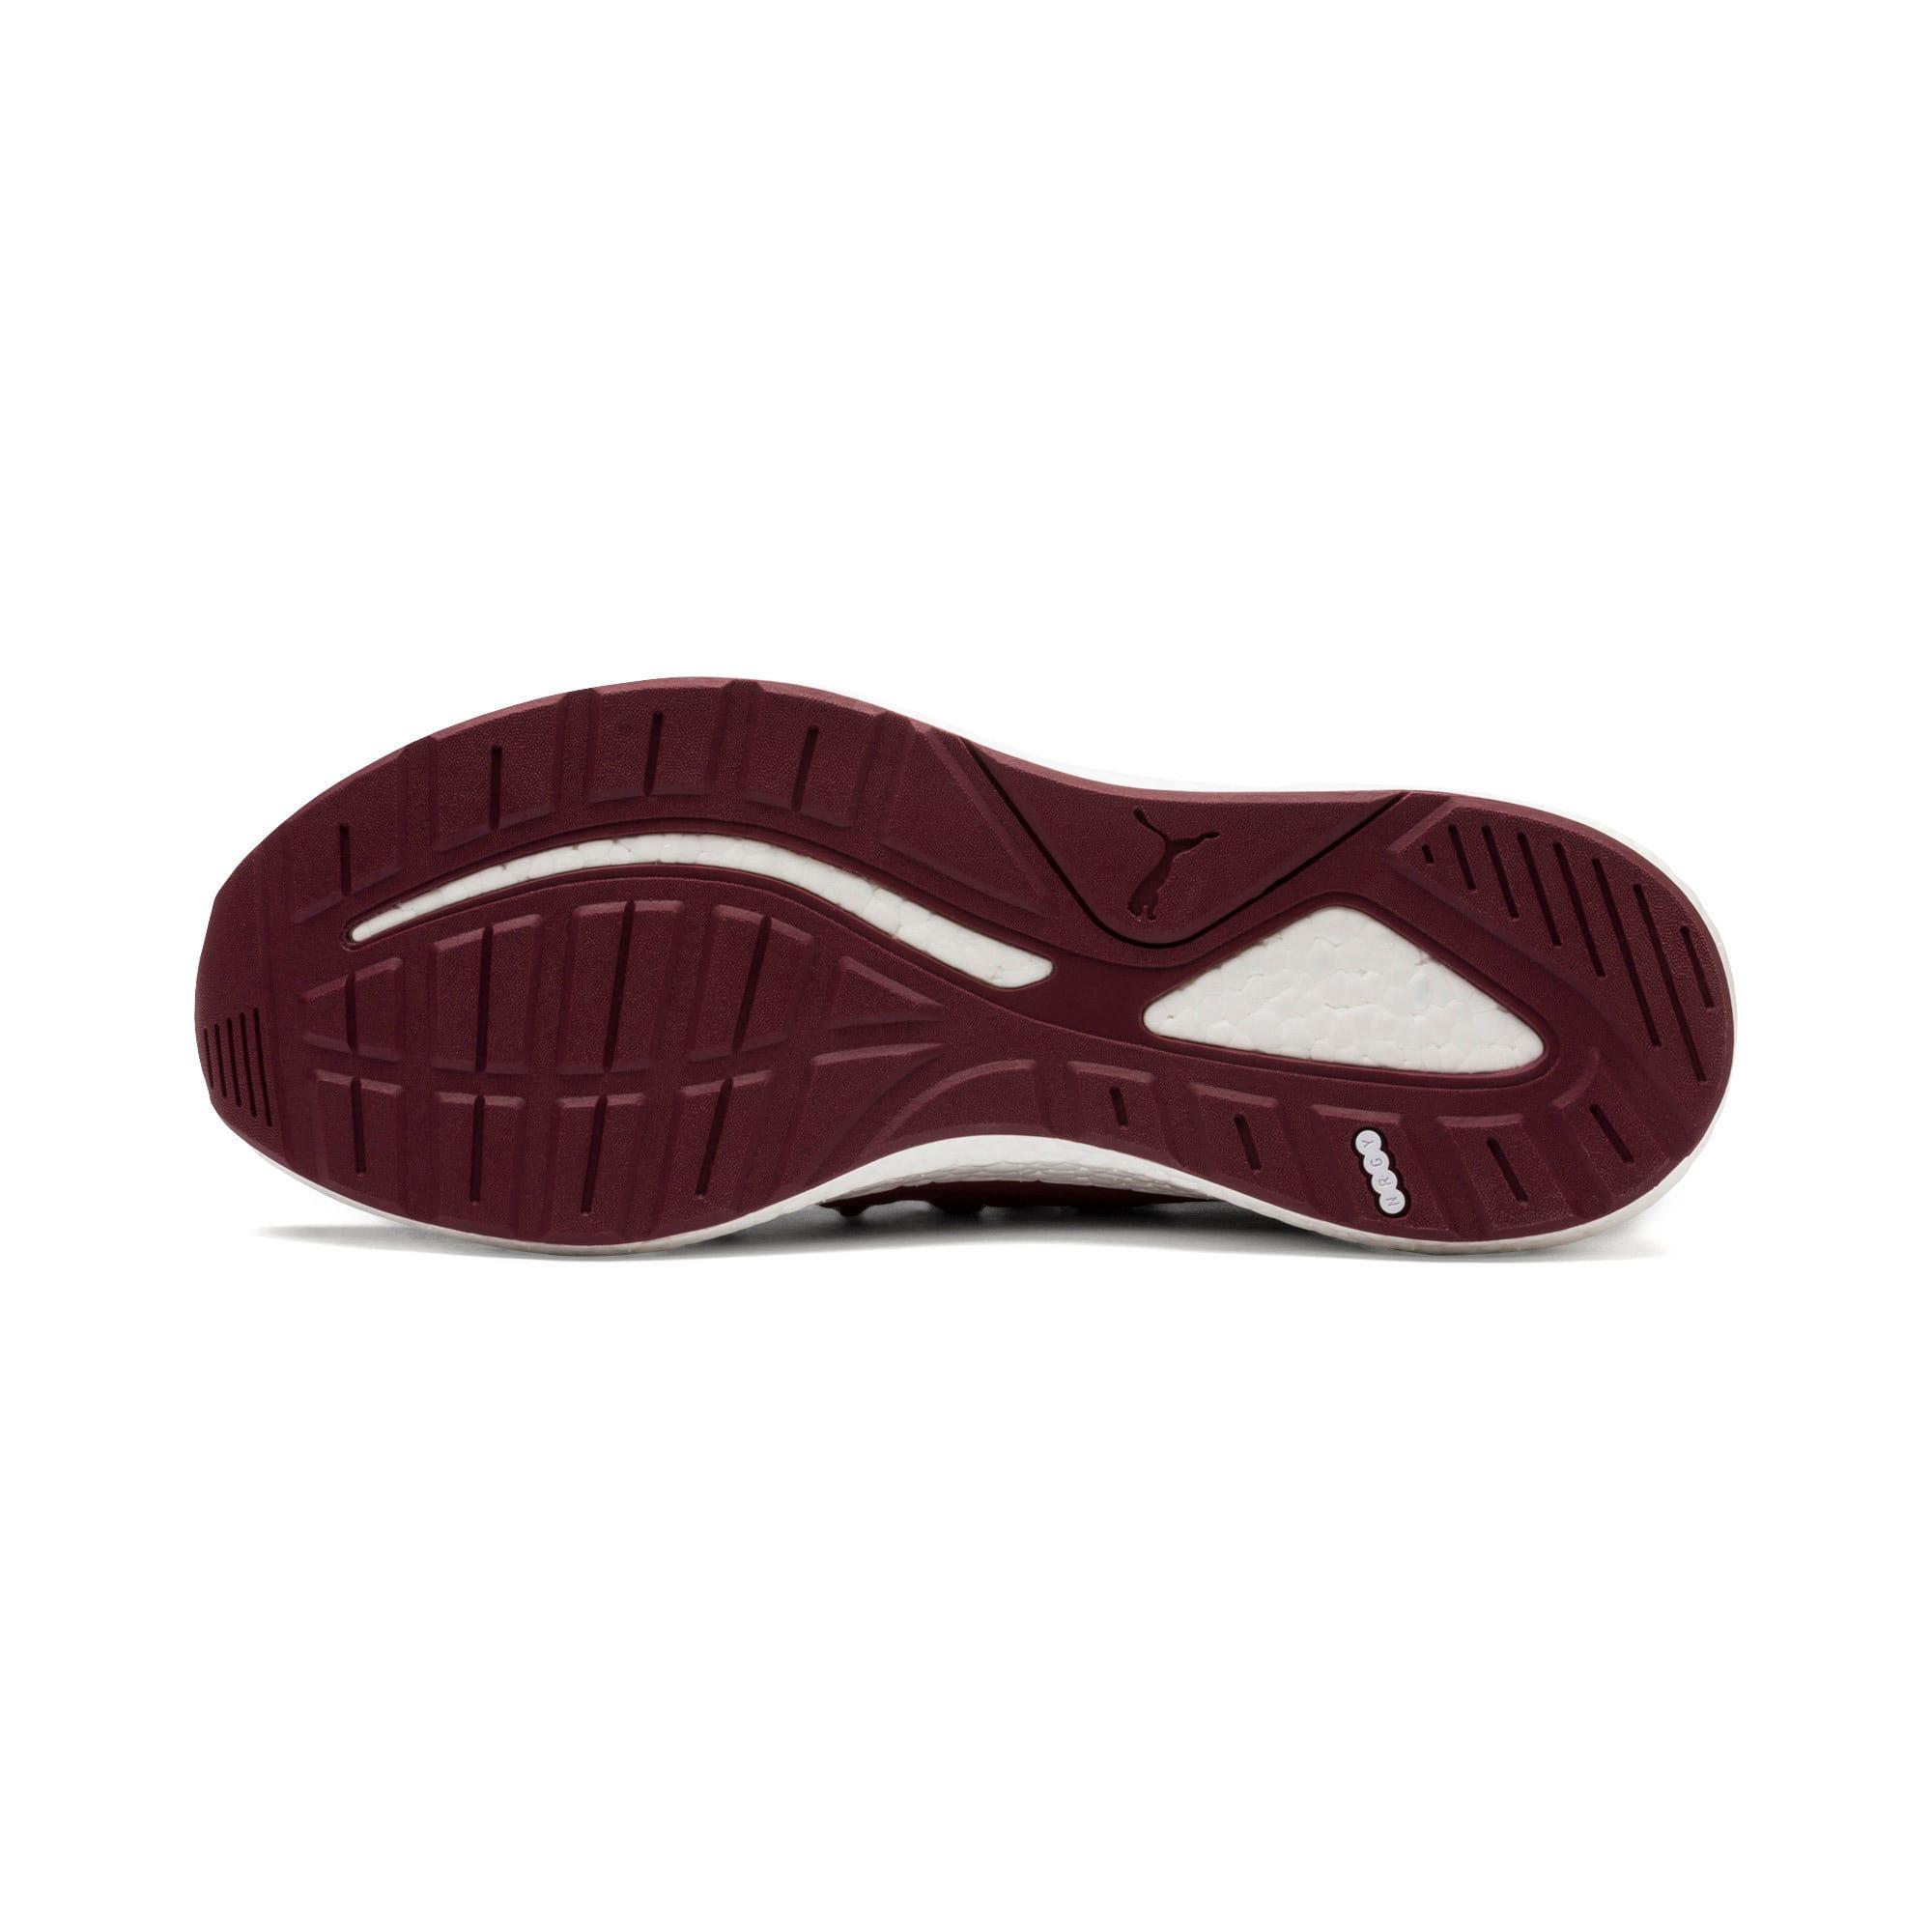 Thumbnail 3 of NRGY Neko Knit Men's Running Shoes, Pomegranate-Puma Black, medium